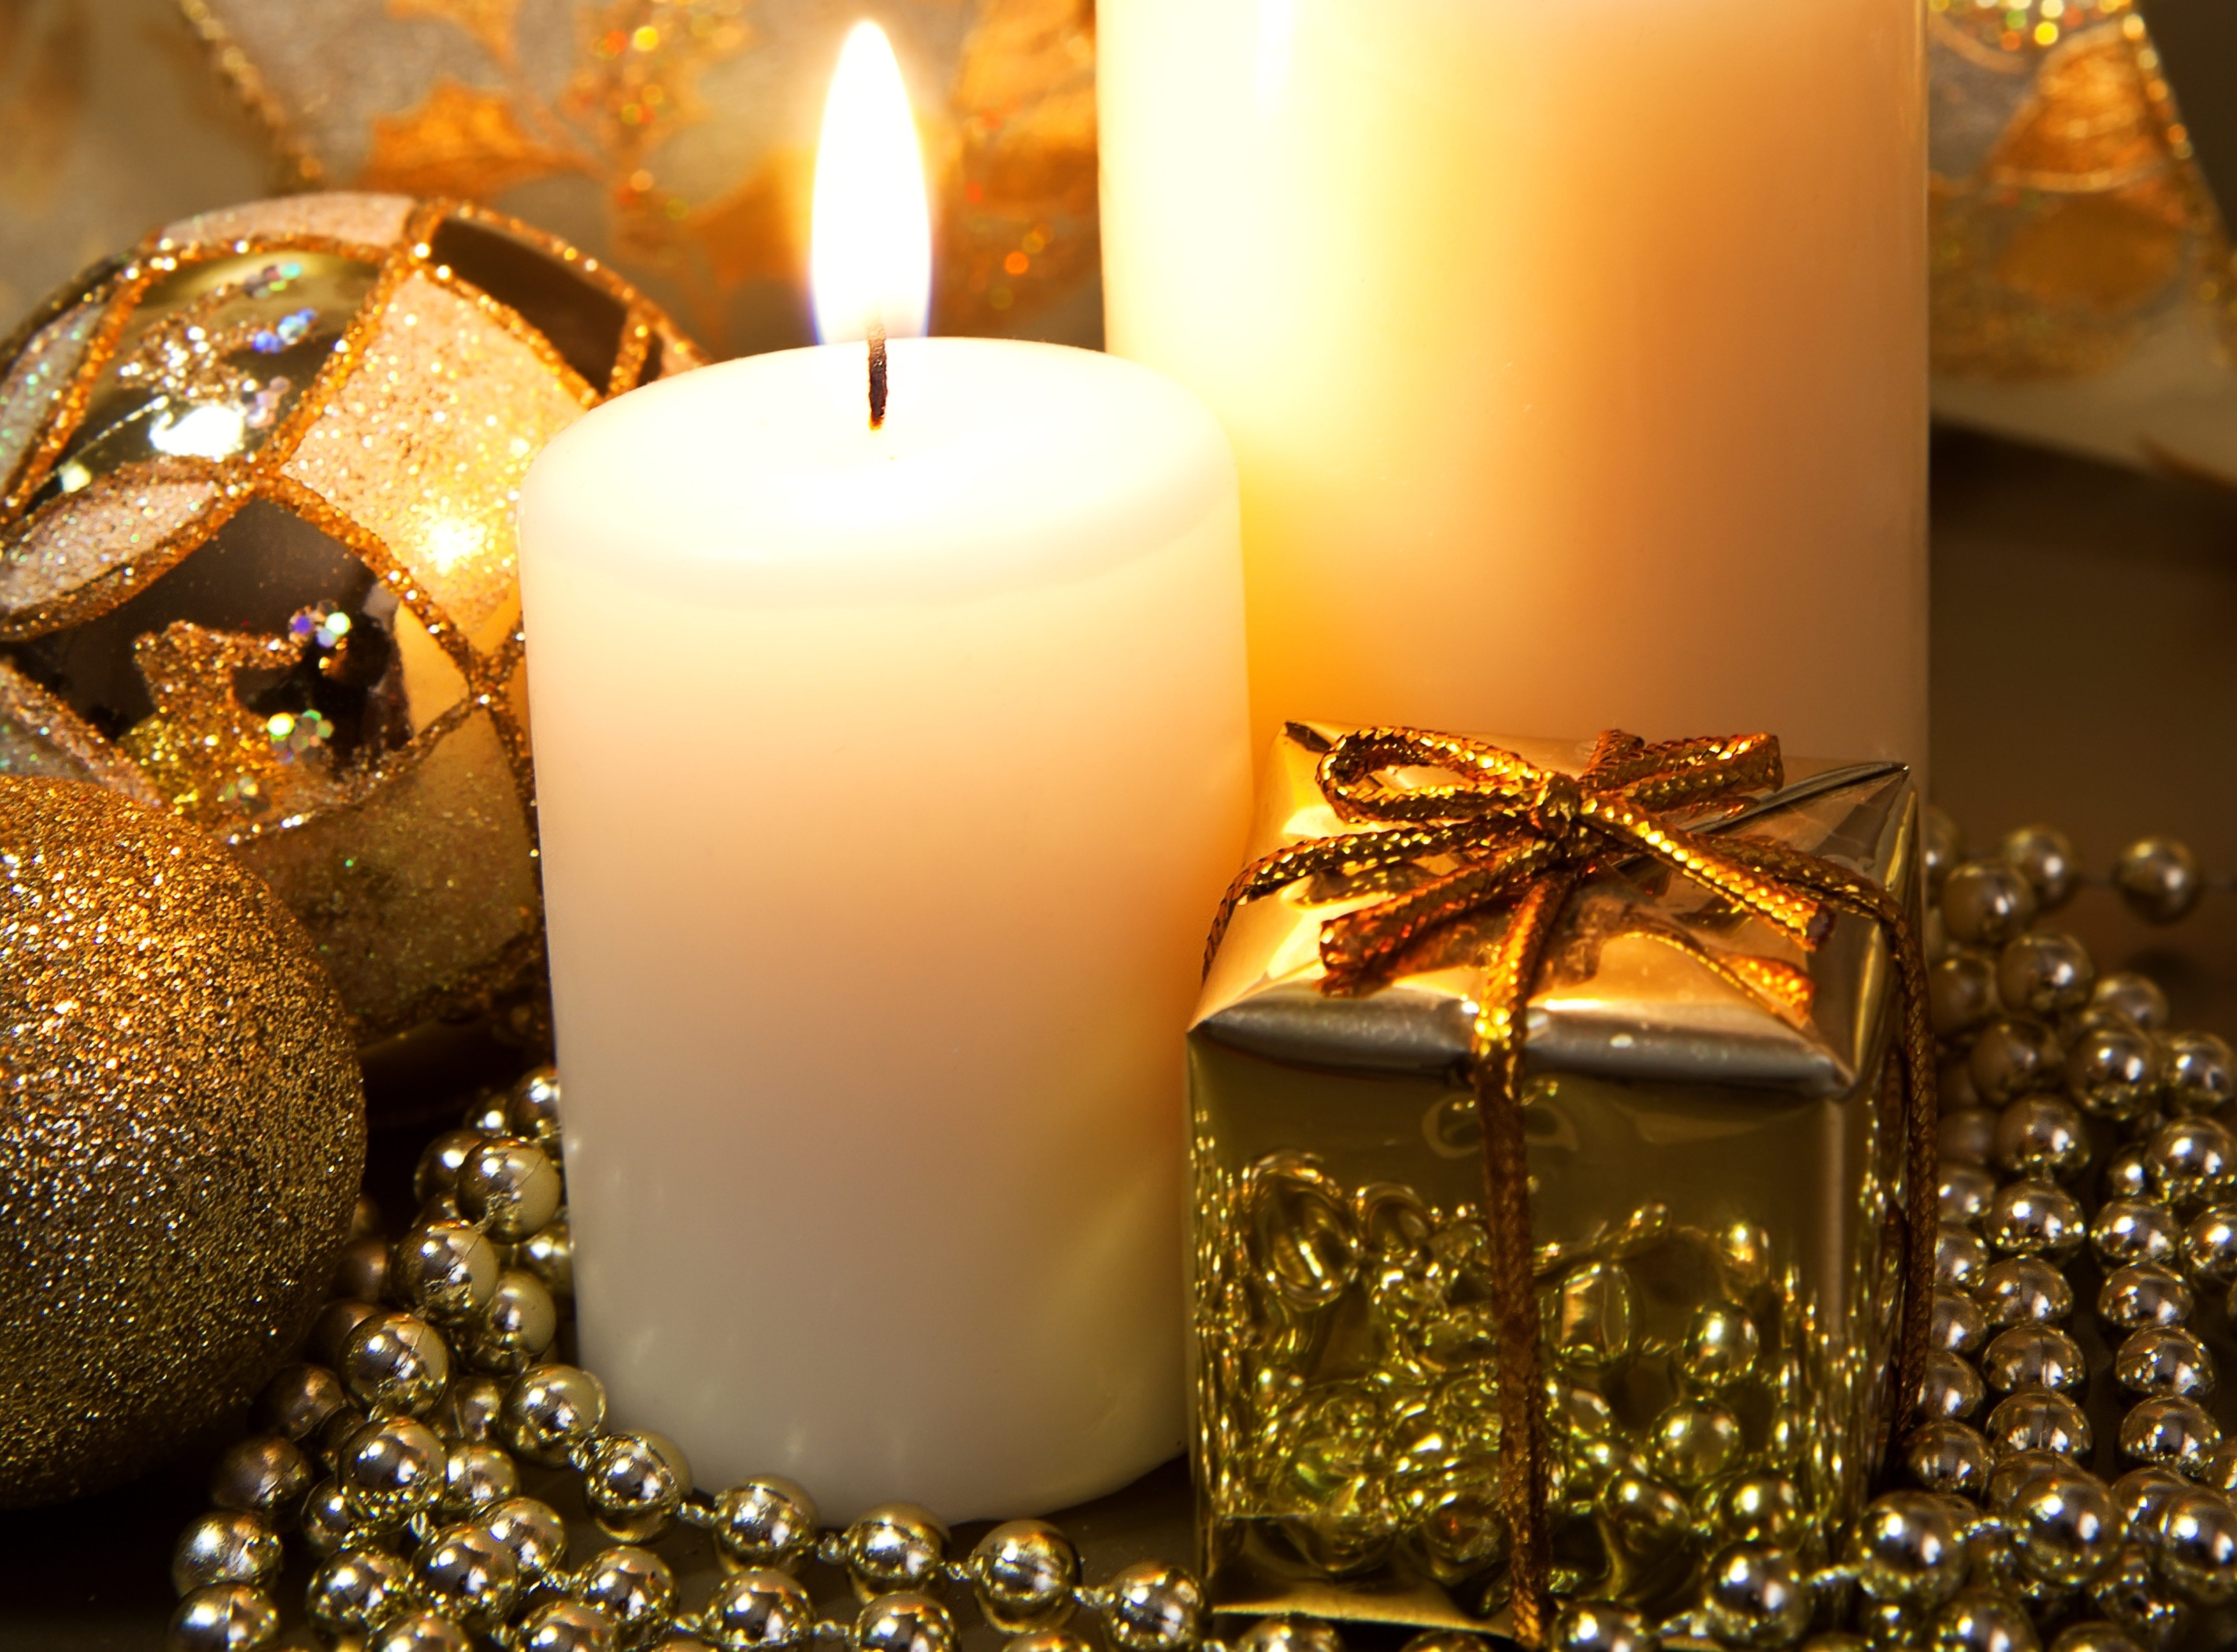 Картинки, свечи на новогодних открытках